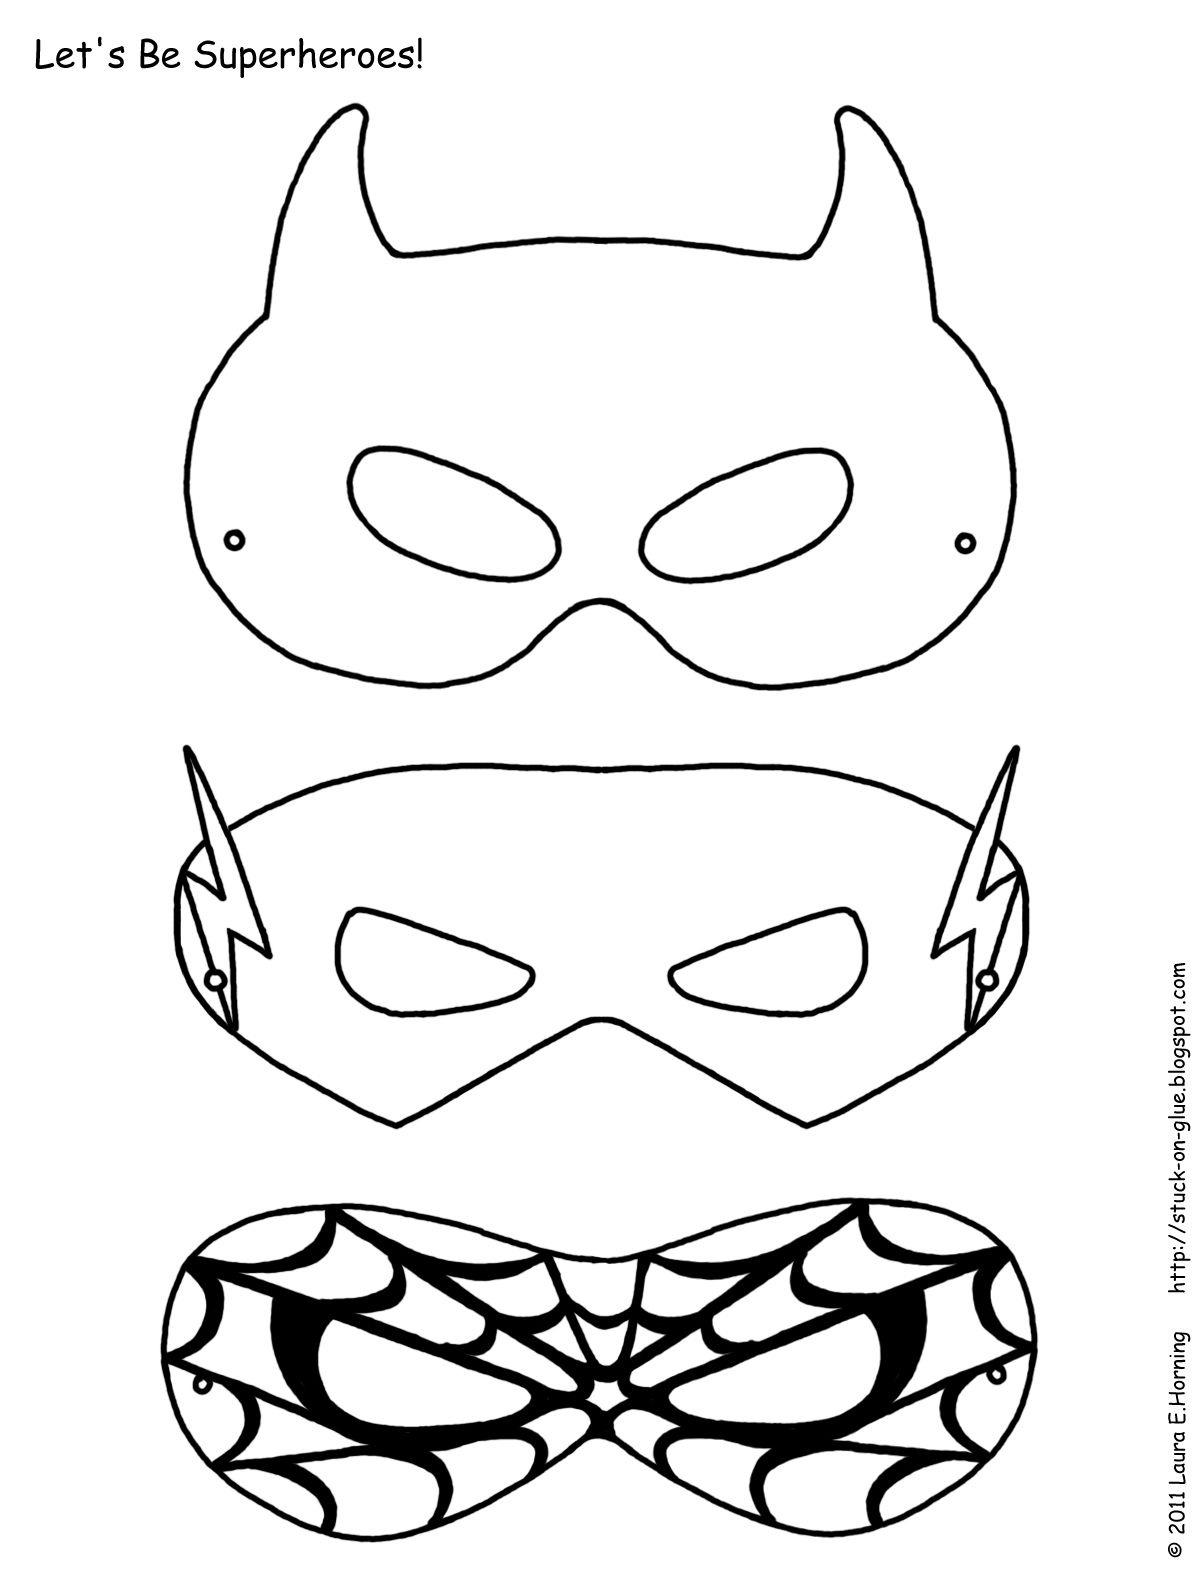 Templates For Superhero Masks - How Have We Survived? | Afterschool - Free Printable Paper Masks